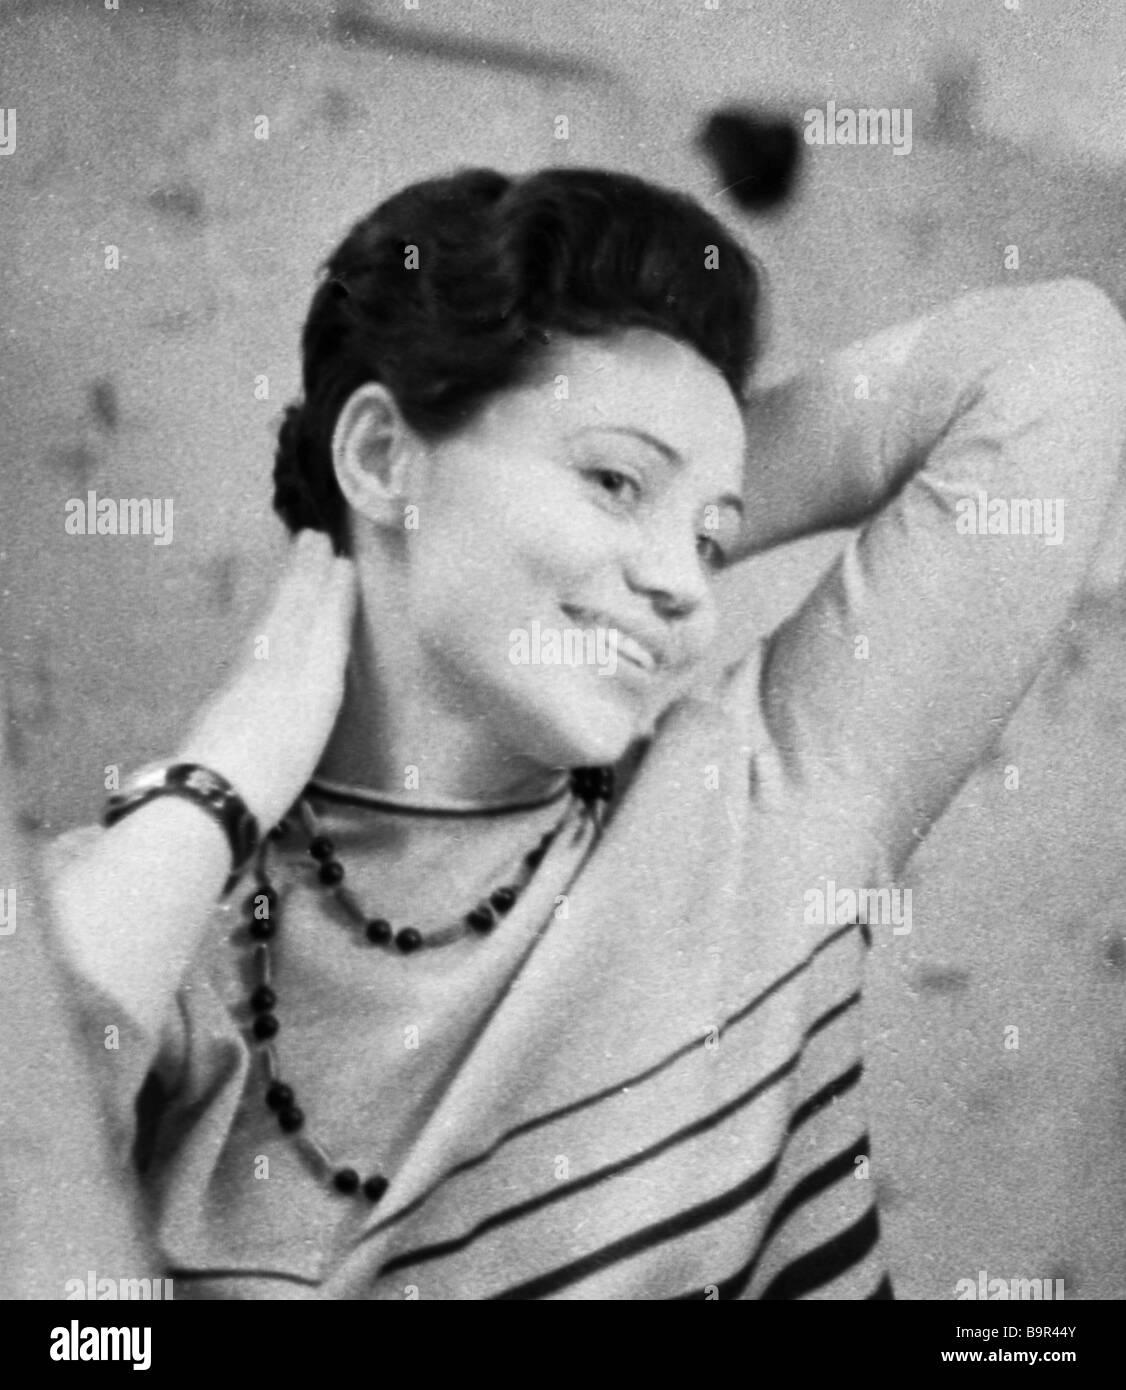 Marina Popovich: biography 84